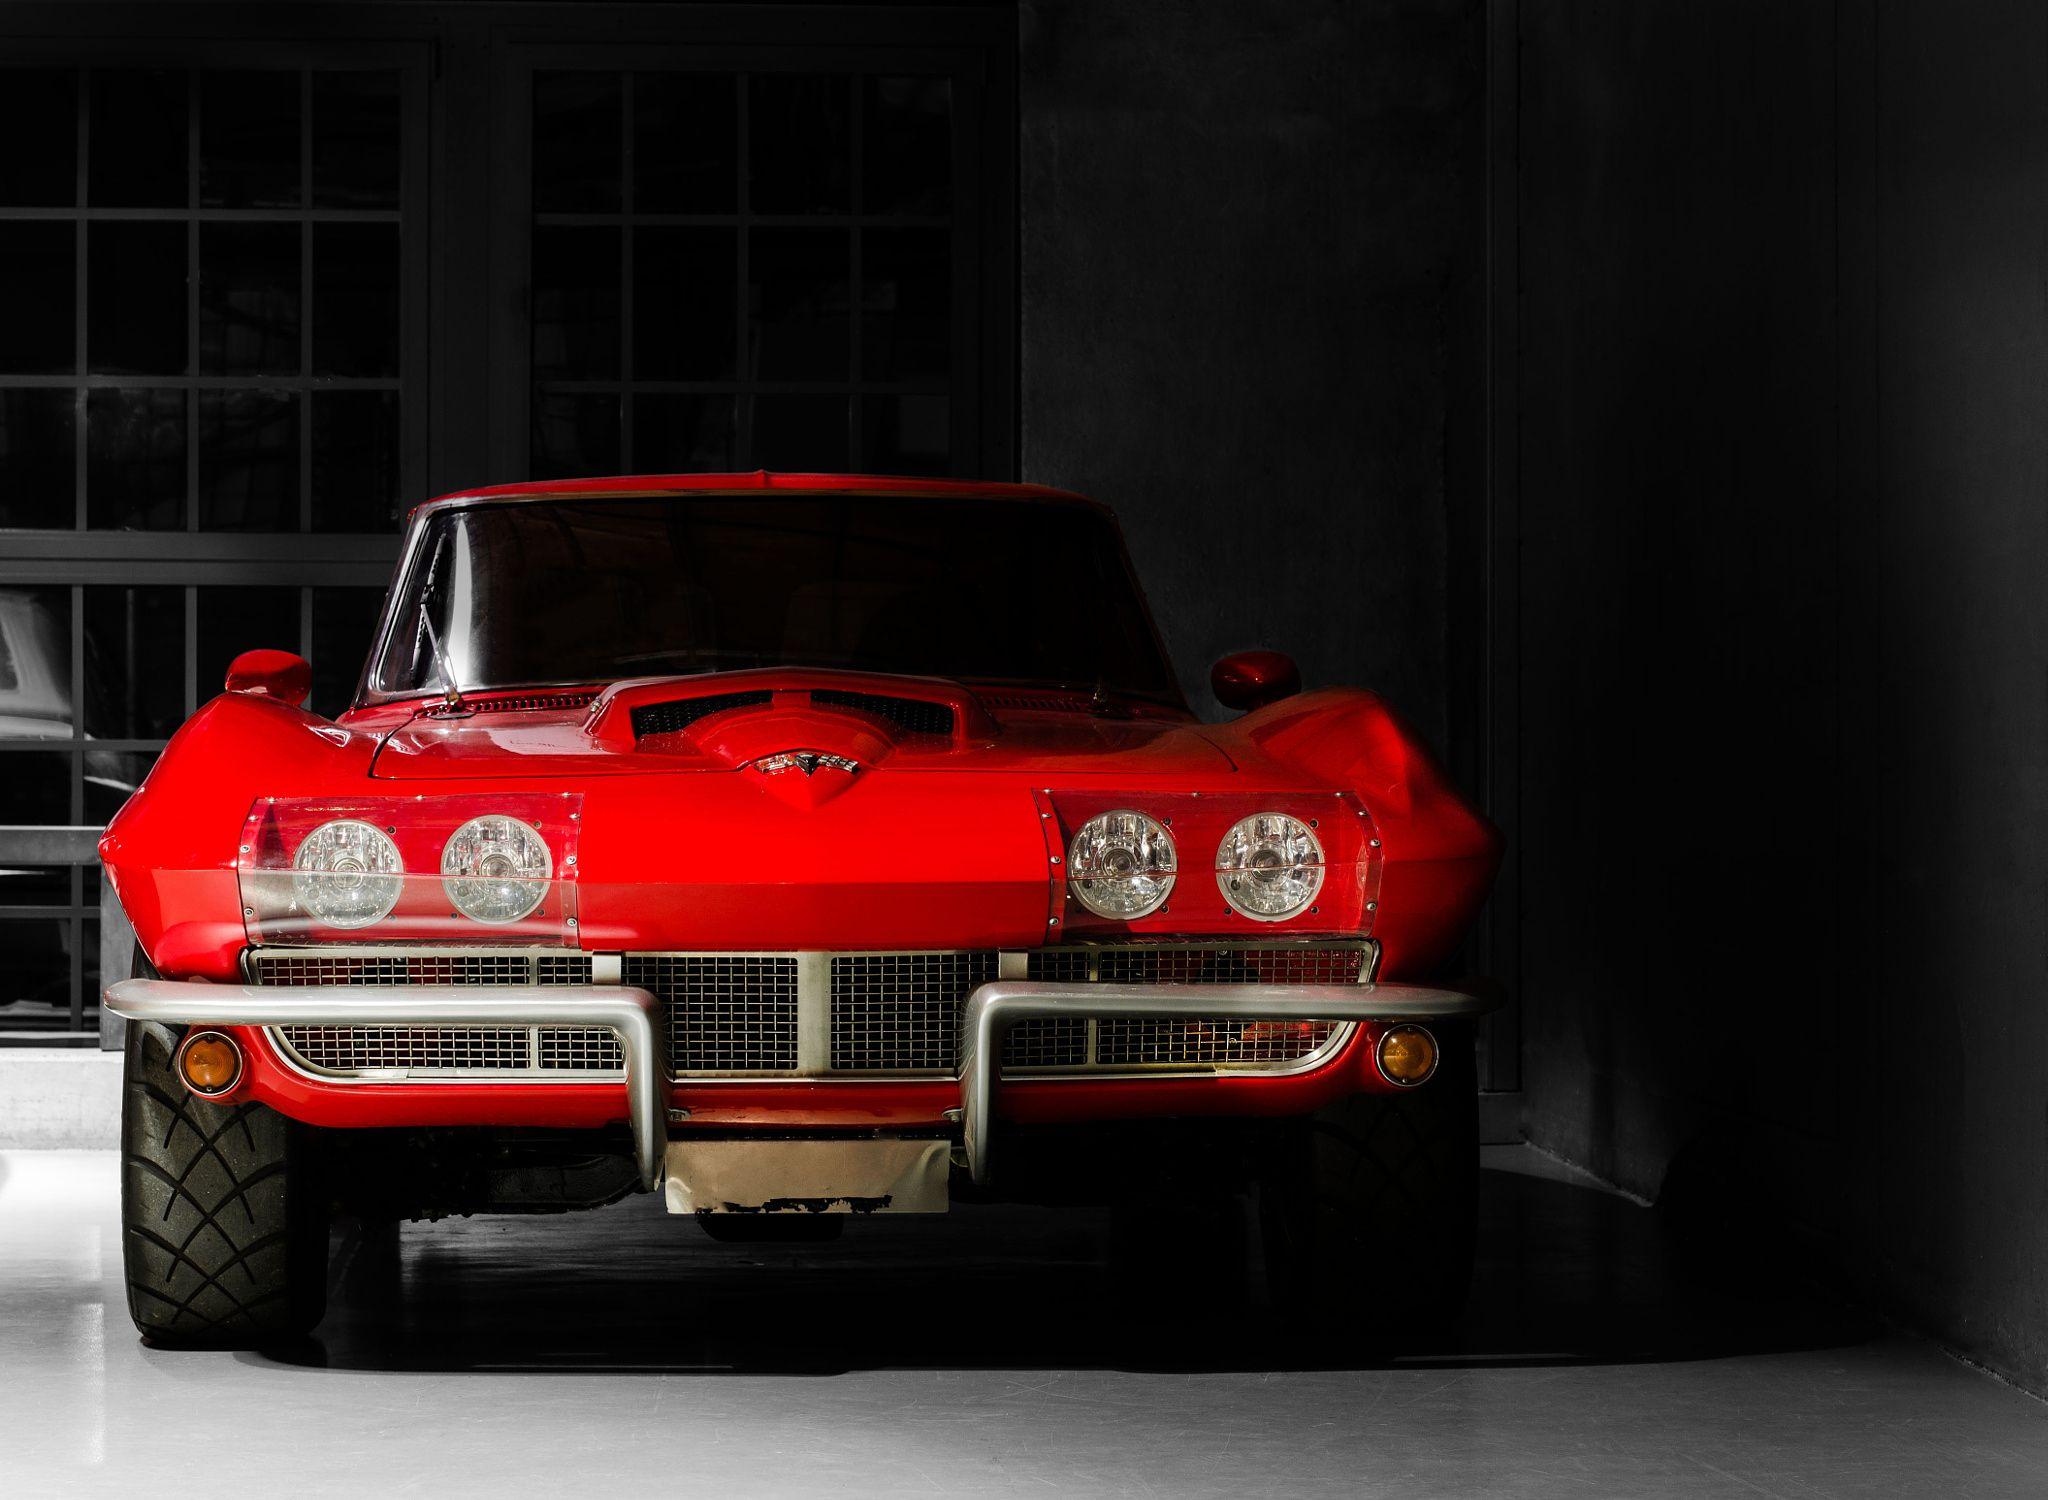 Corvette (With images) Chevrolet corvette, Corvette, Cars